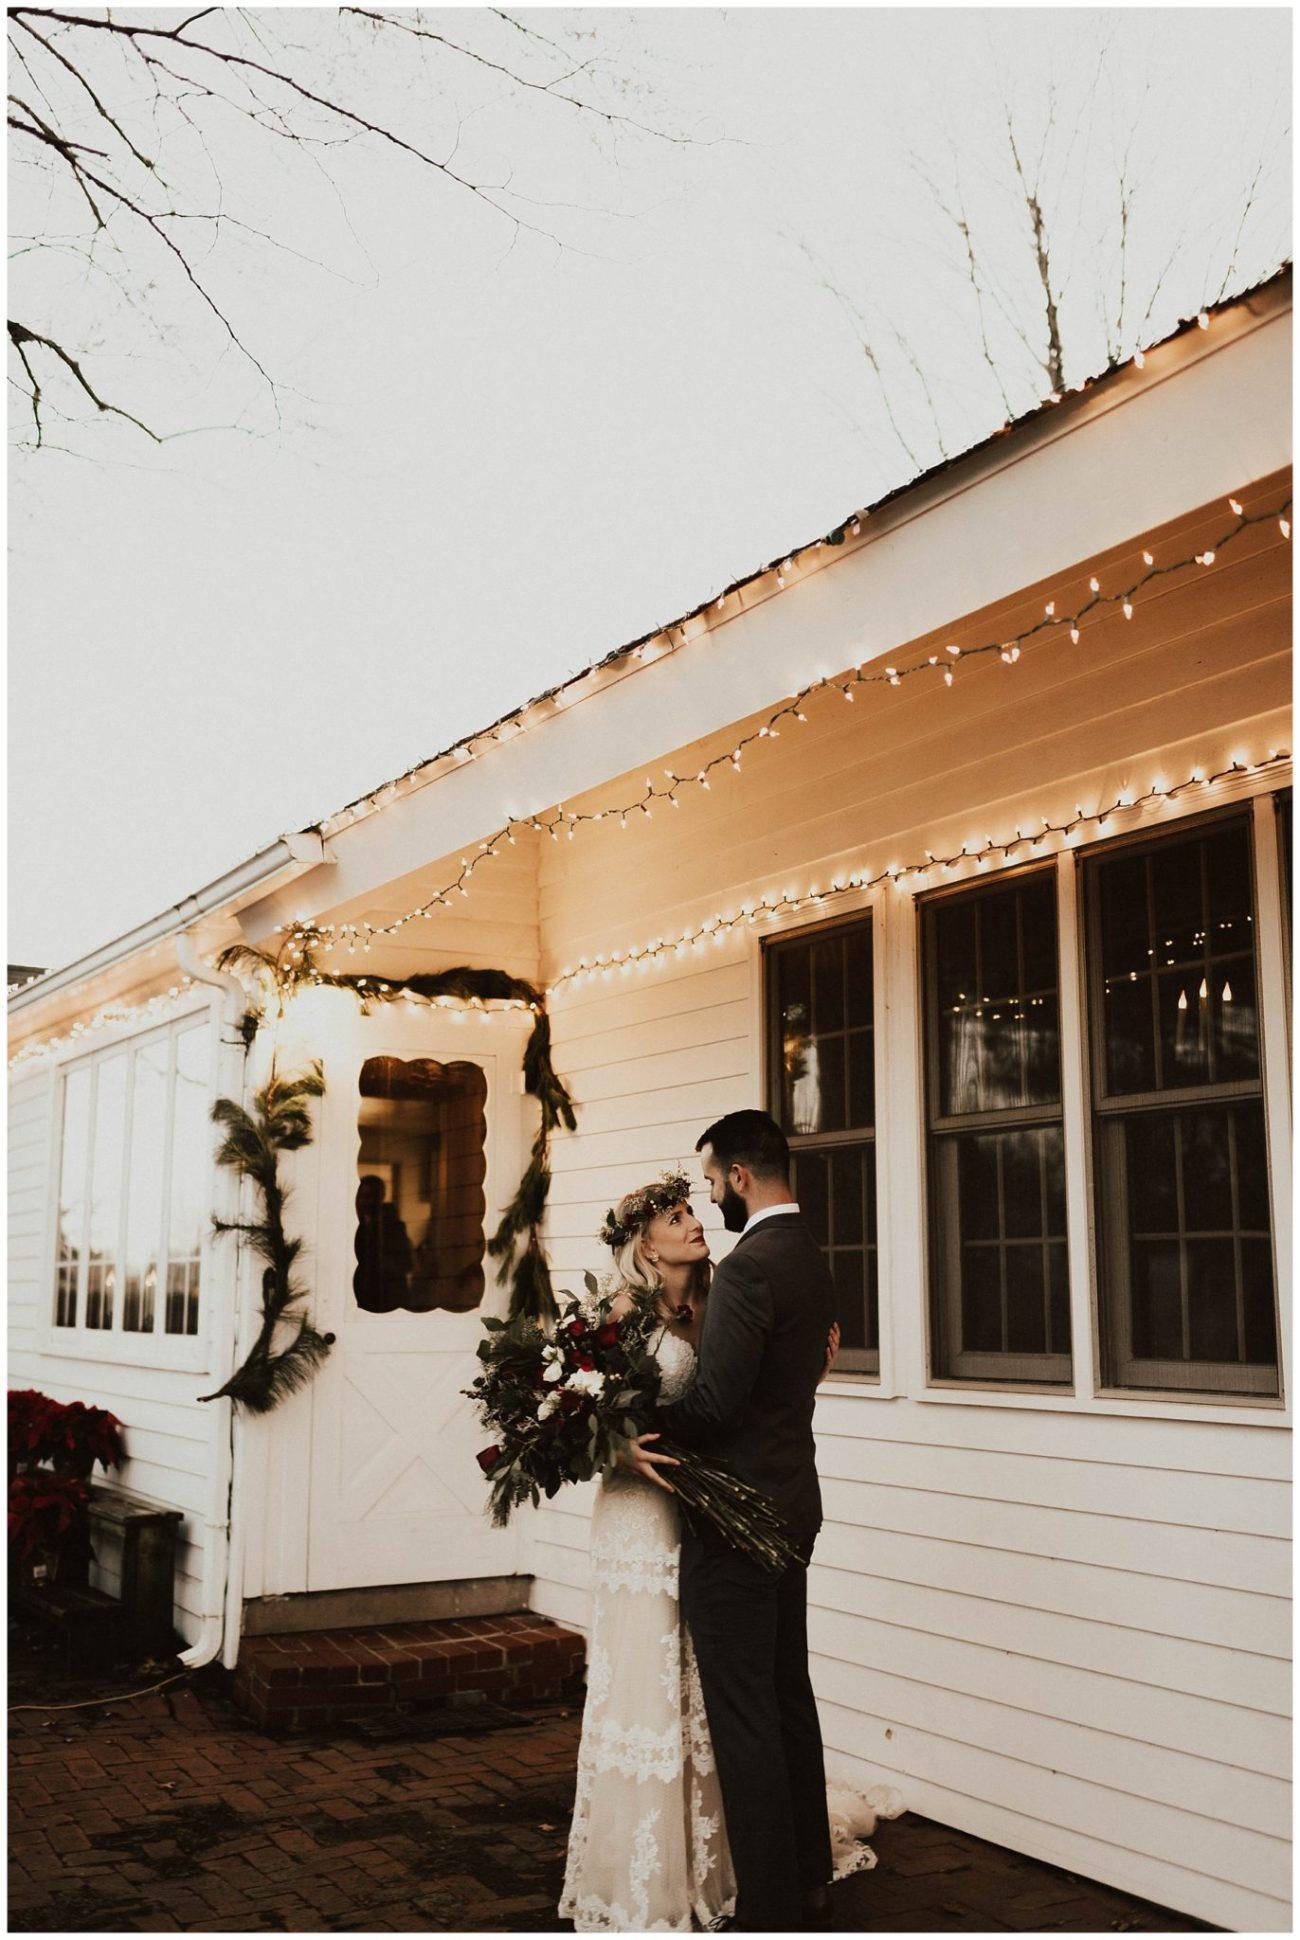 8a8588d29eaf8 Hannah + Brian // Christmas Cabin Wedding - Lauren F.otography ...